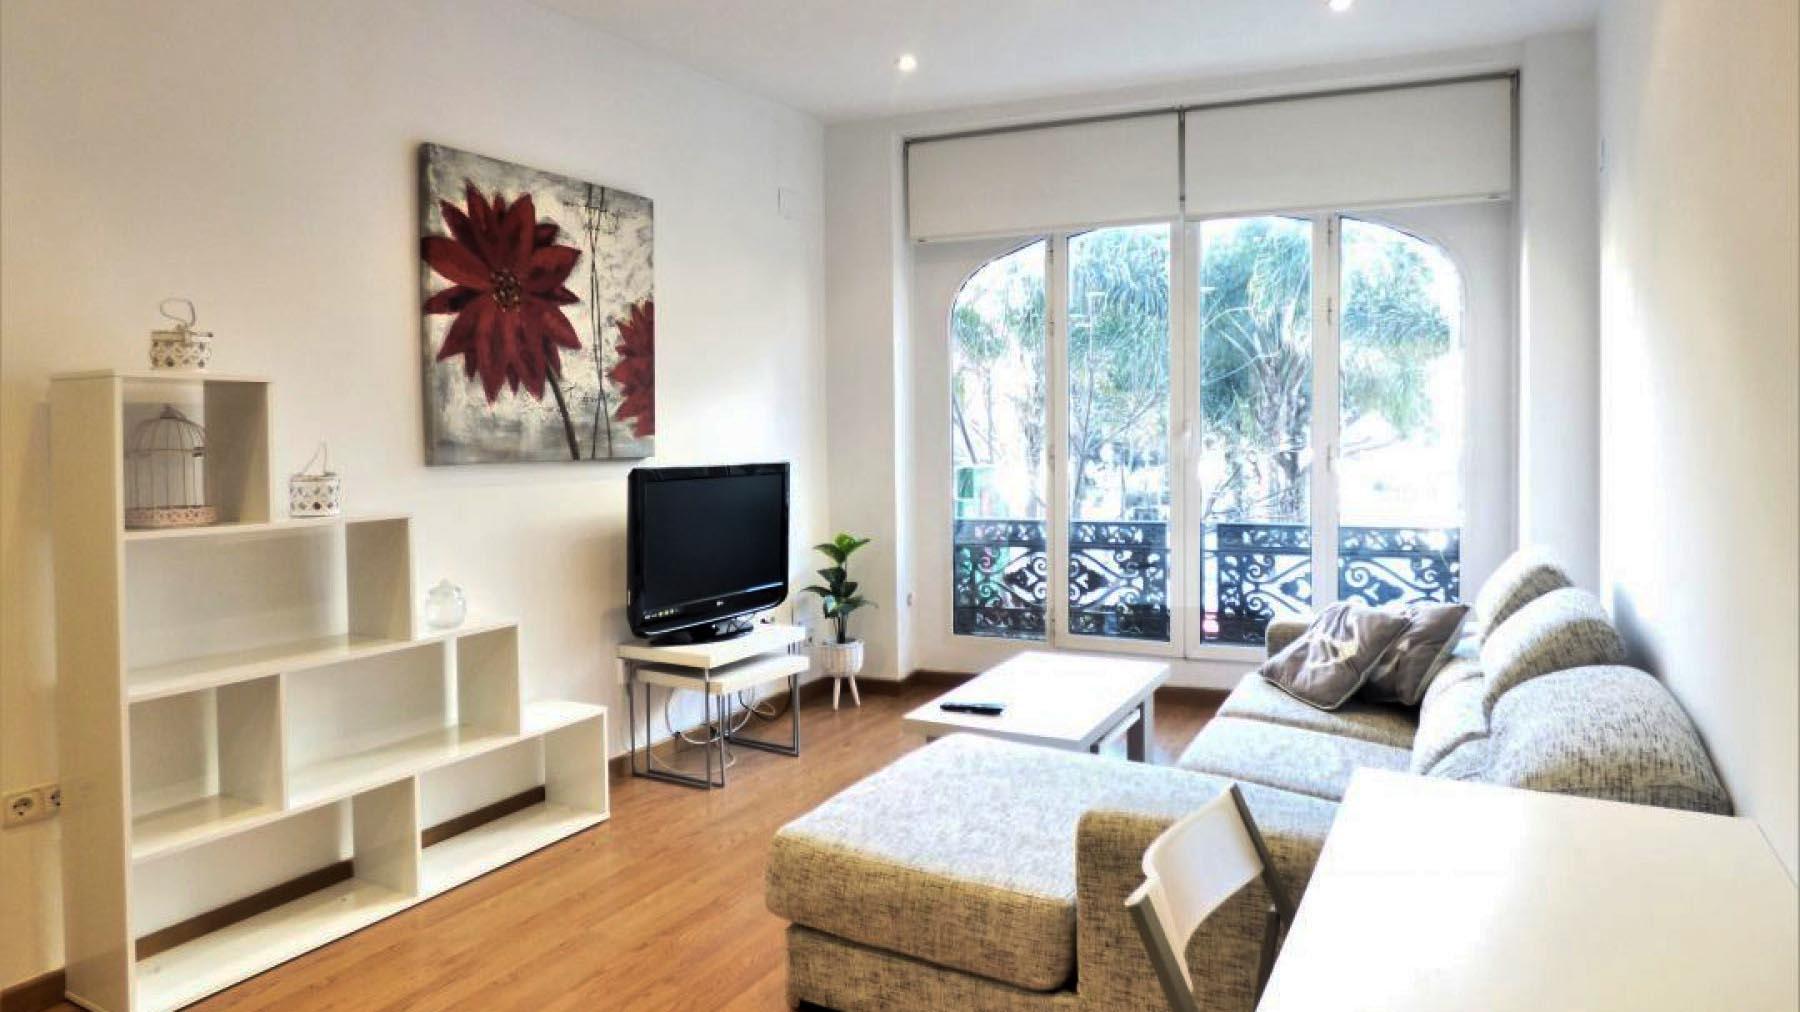 Аренда квартира в Испании город Аликанте 2 спальни